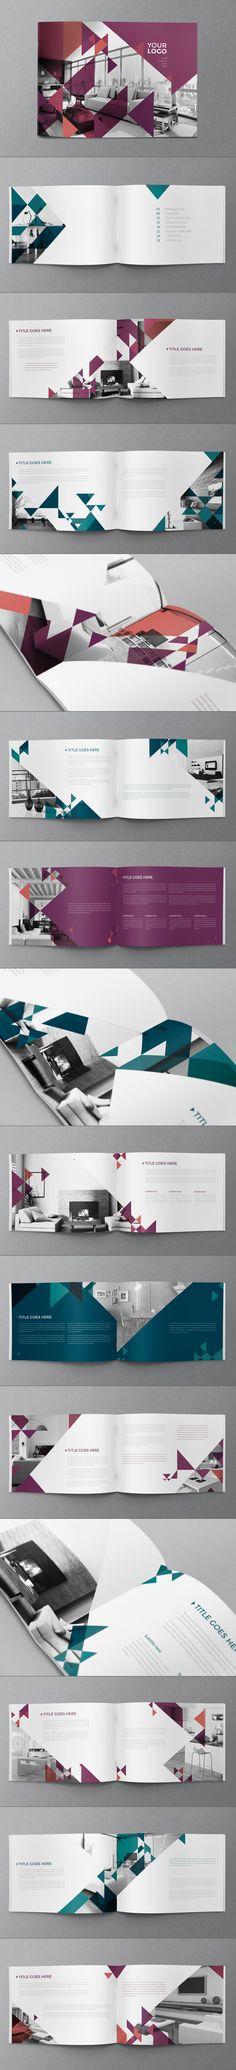 Modern Red Blue Brochure. Download here: http://graphicriver.net/item/modern-red-blue-brochure/8113627?ref=abradesign #design #brochure                                                                                                                                                                                 Más